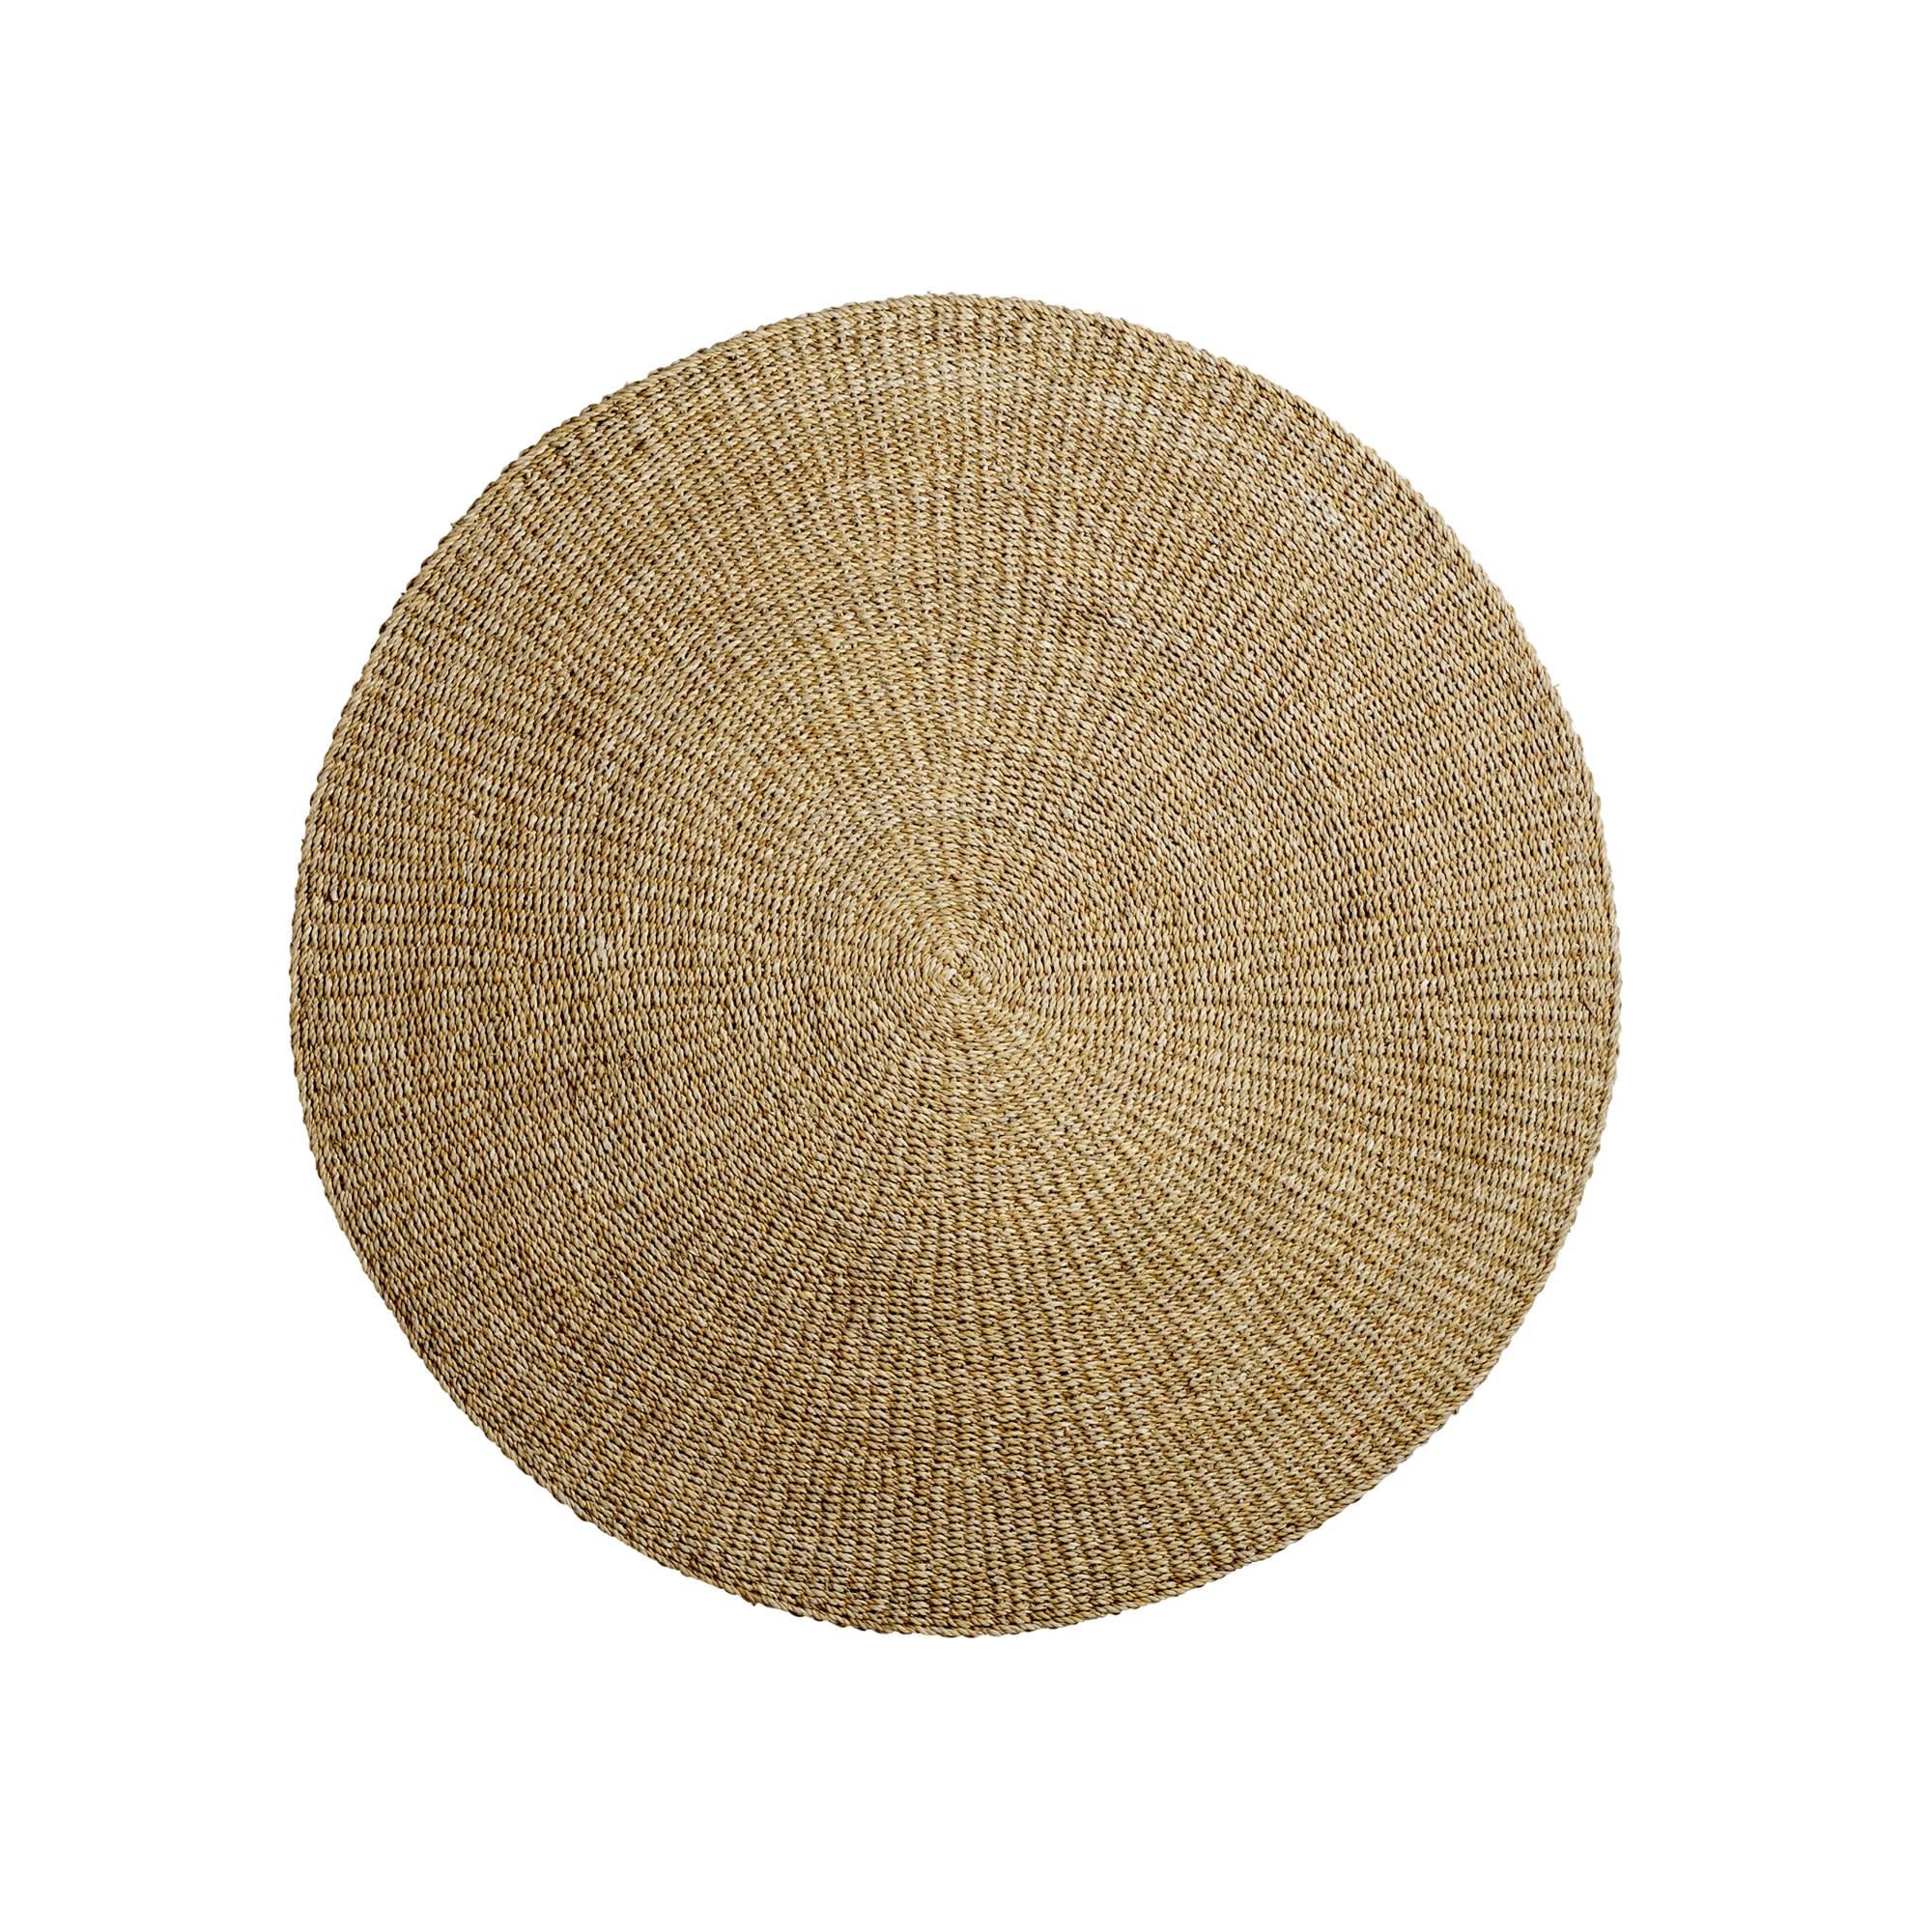 Bloomingville Woven Seagrass Circular Round Rug